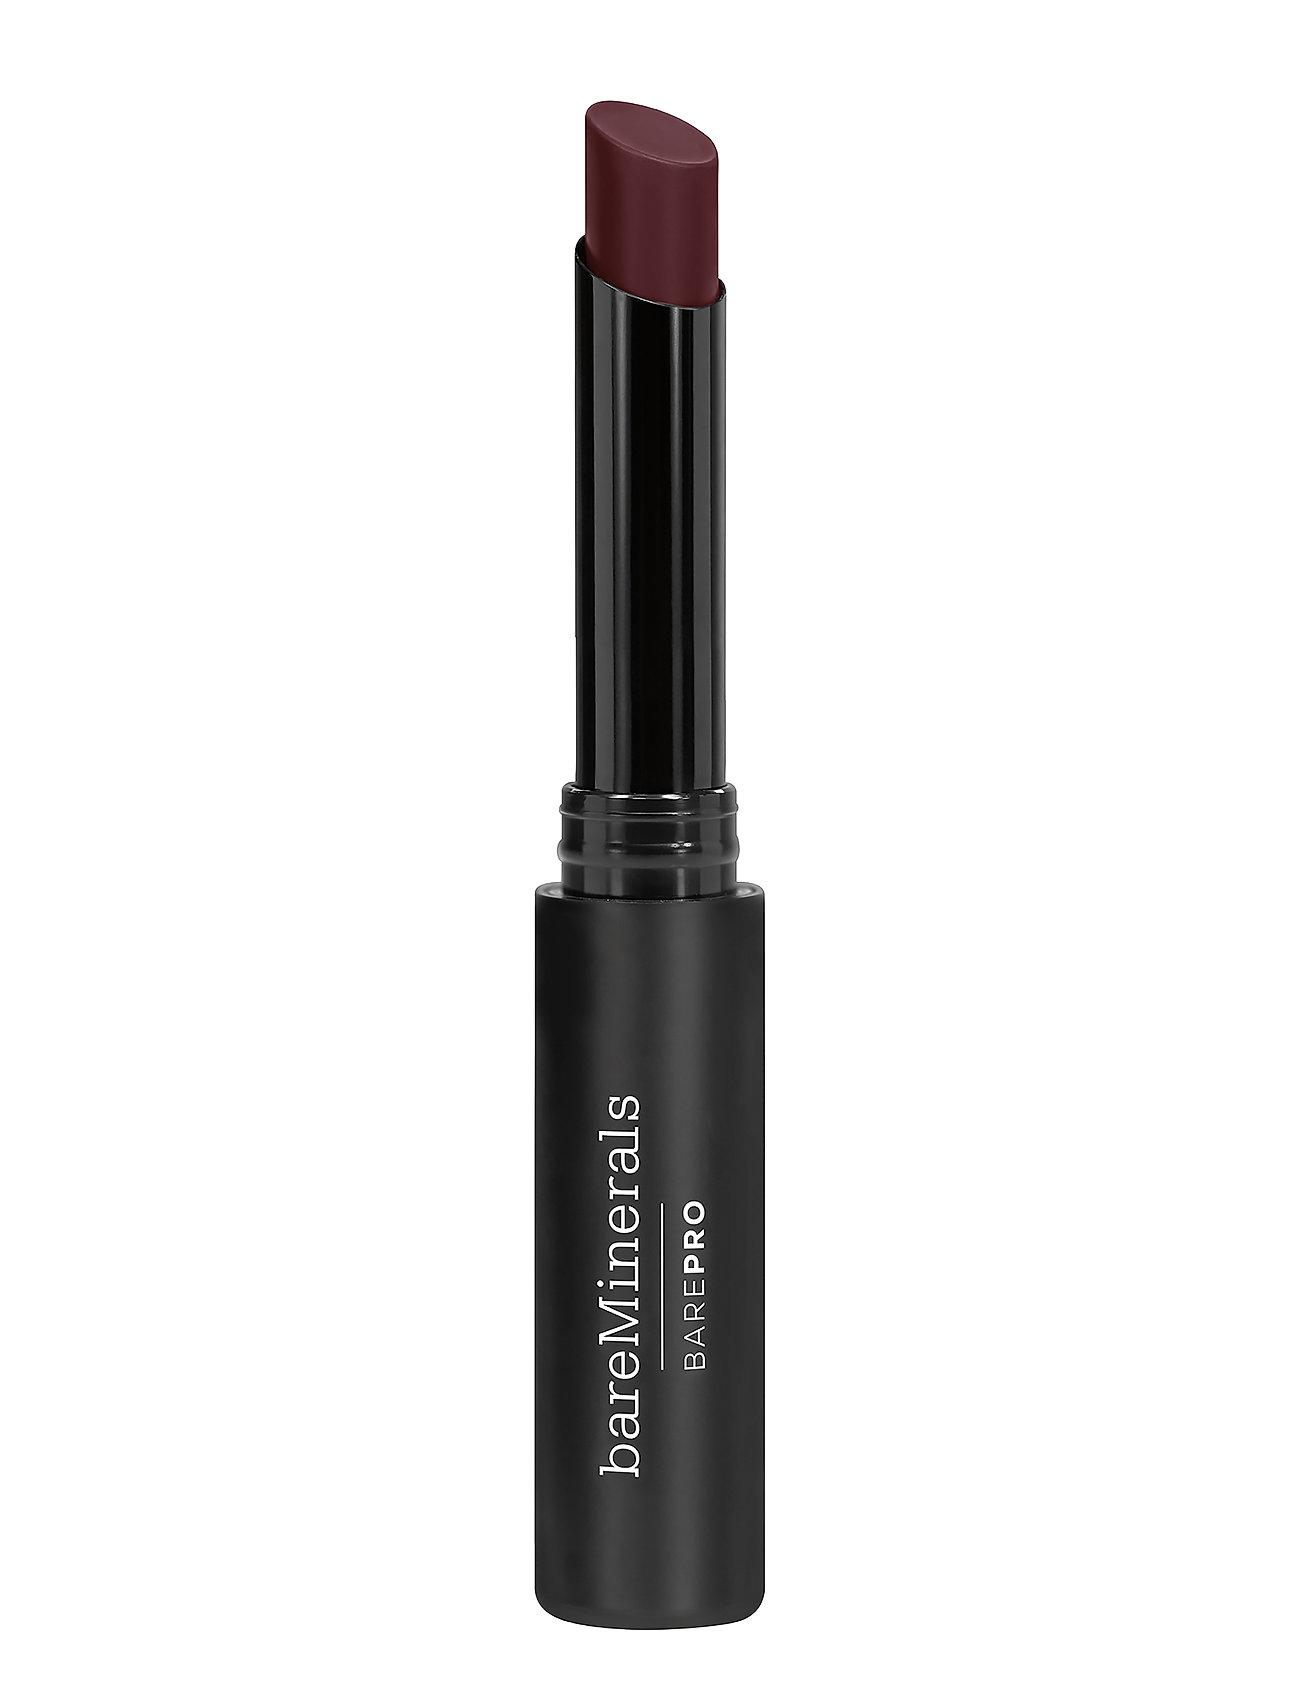 Image of Barepro Longwear Lipstick Blackberry Læbestift Makeup Lilla BareMinerals (3138616969)